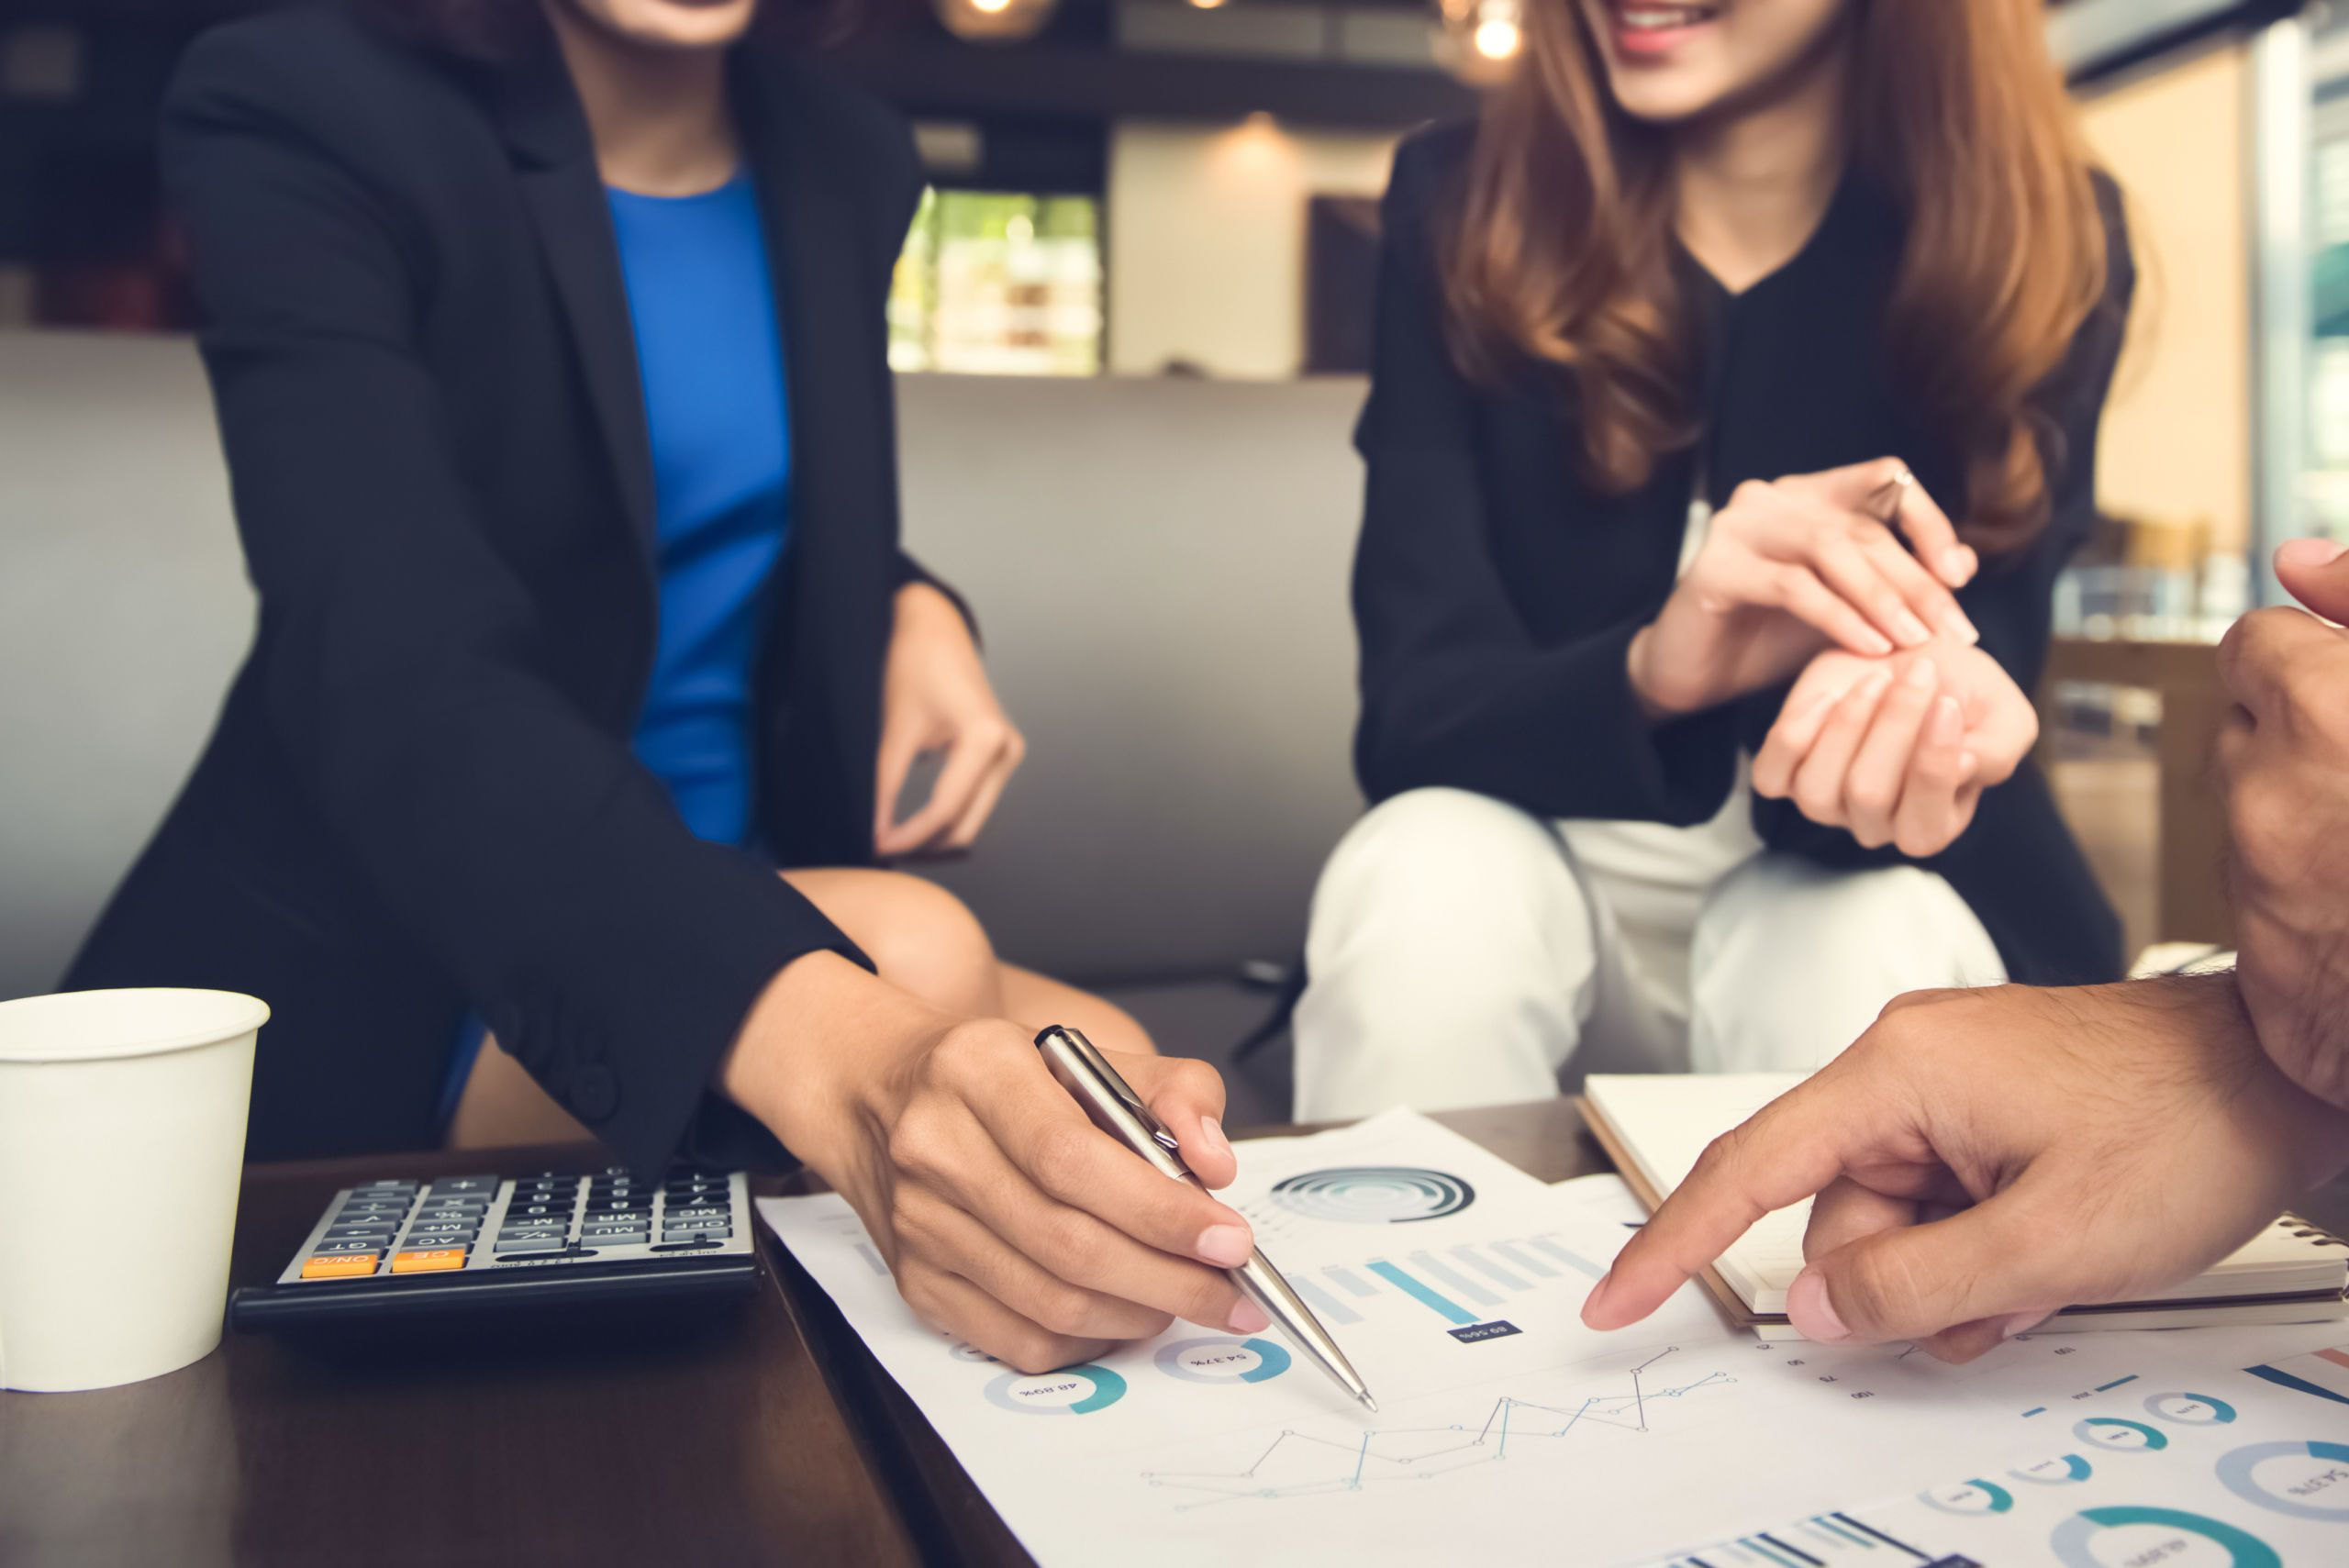 Should You Hire a Financial Advisor?